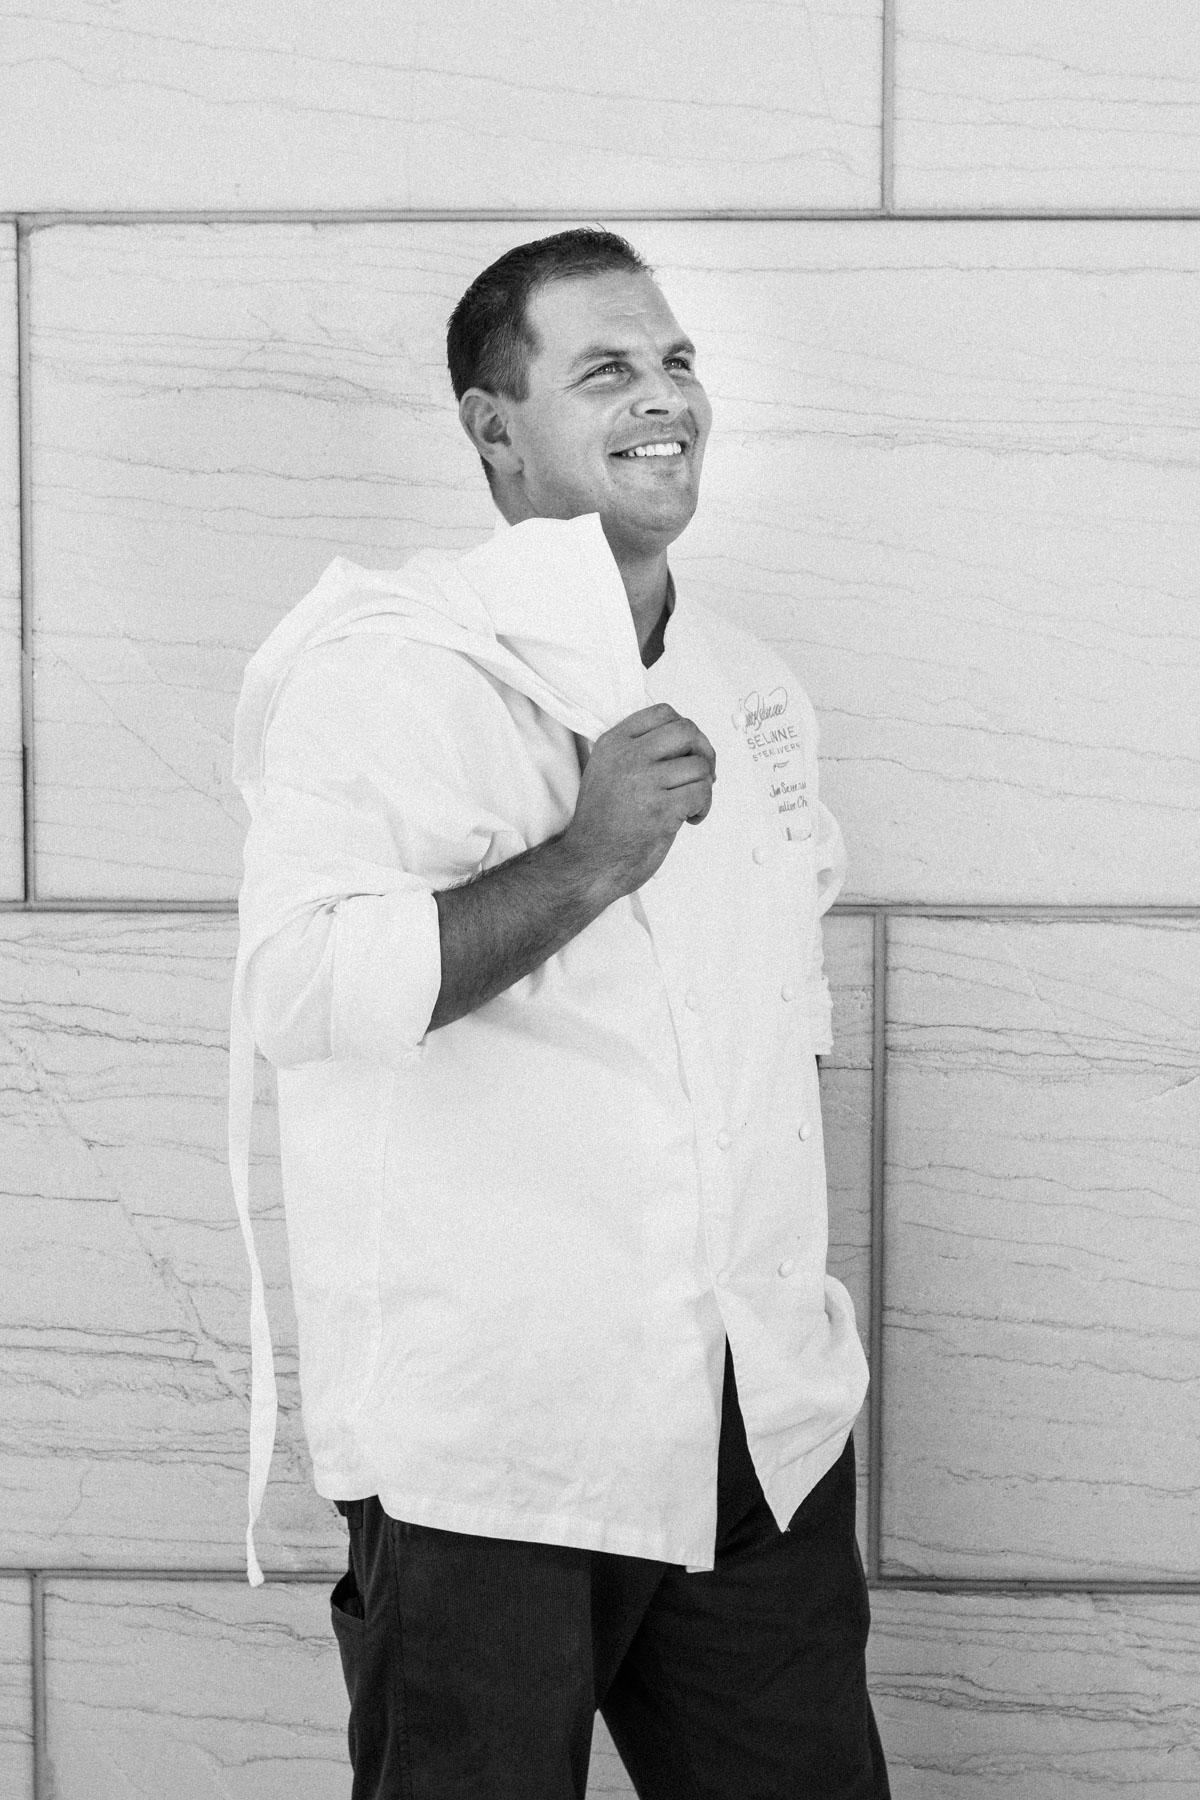 18. Chef Joshua Severson / Selanne Steak Tavern / Laguna Beach, California